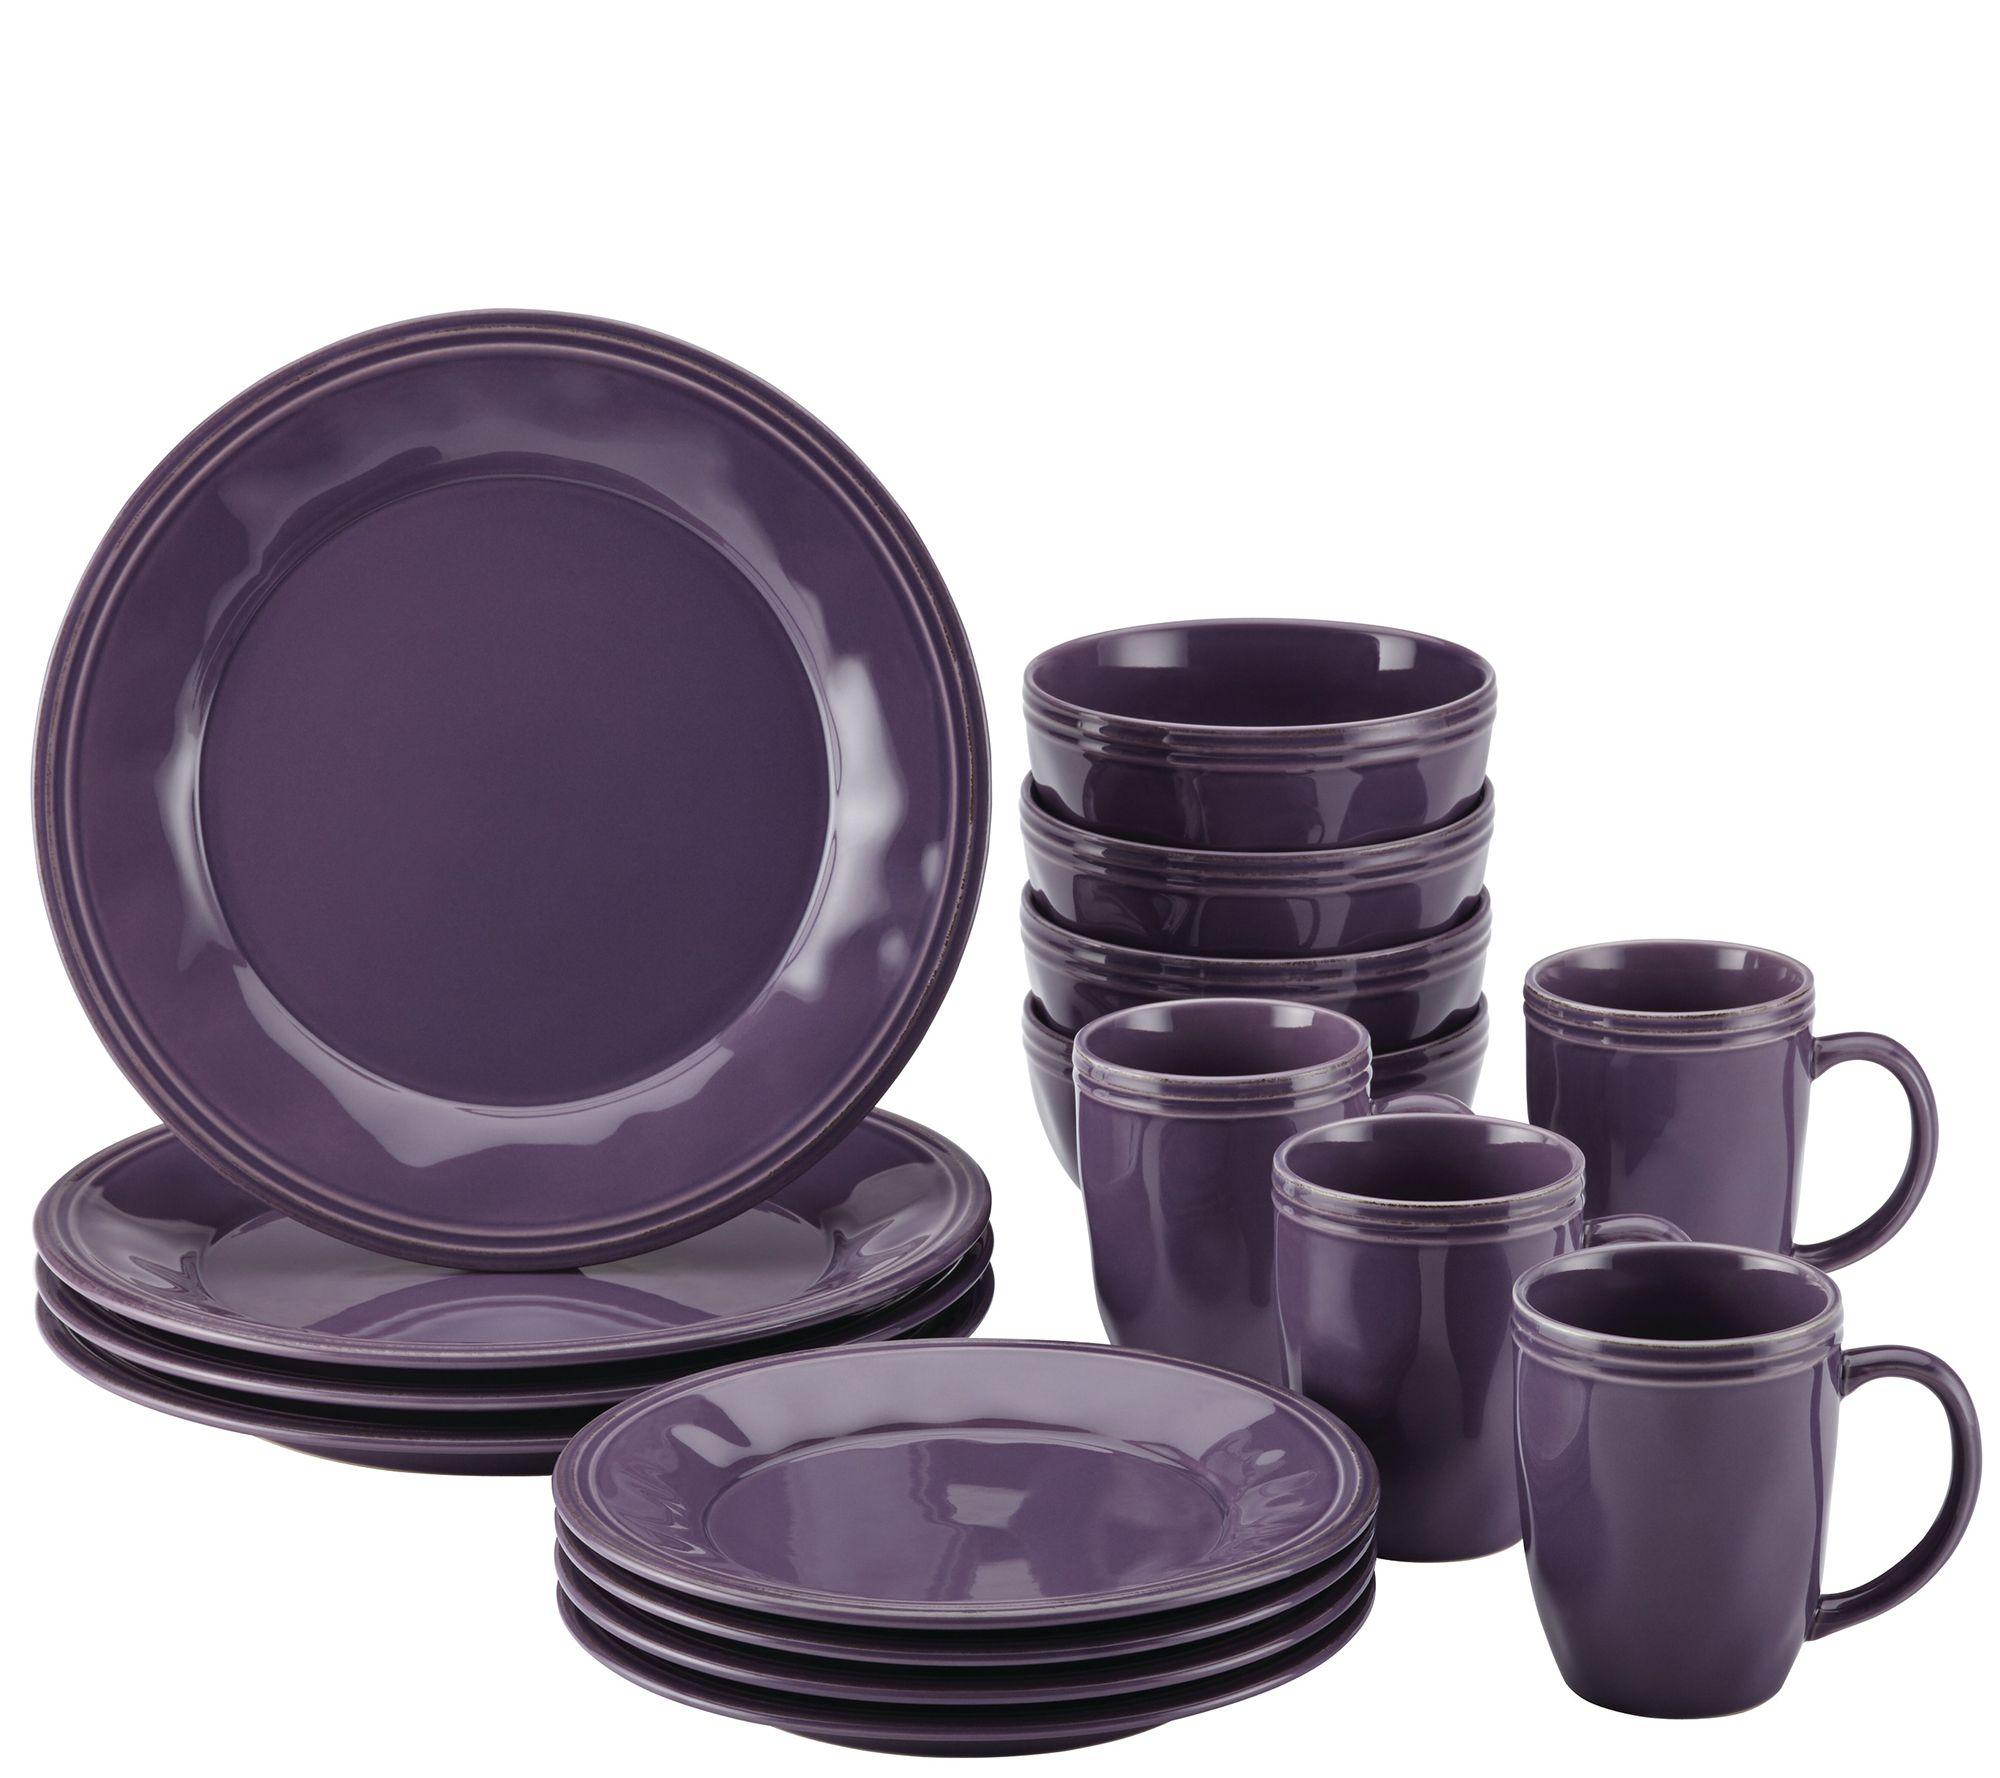 sc 1 st  QVC.com & Rachael Ray Cucina 16-Piece Stoneware Dinnerware Set - Page 1 u2014 QVC.com